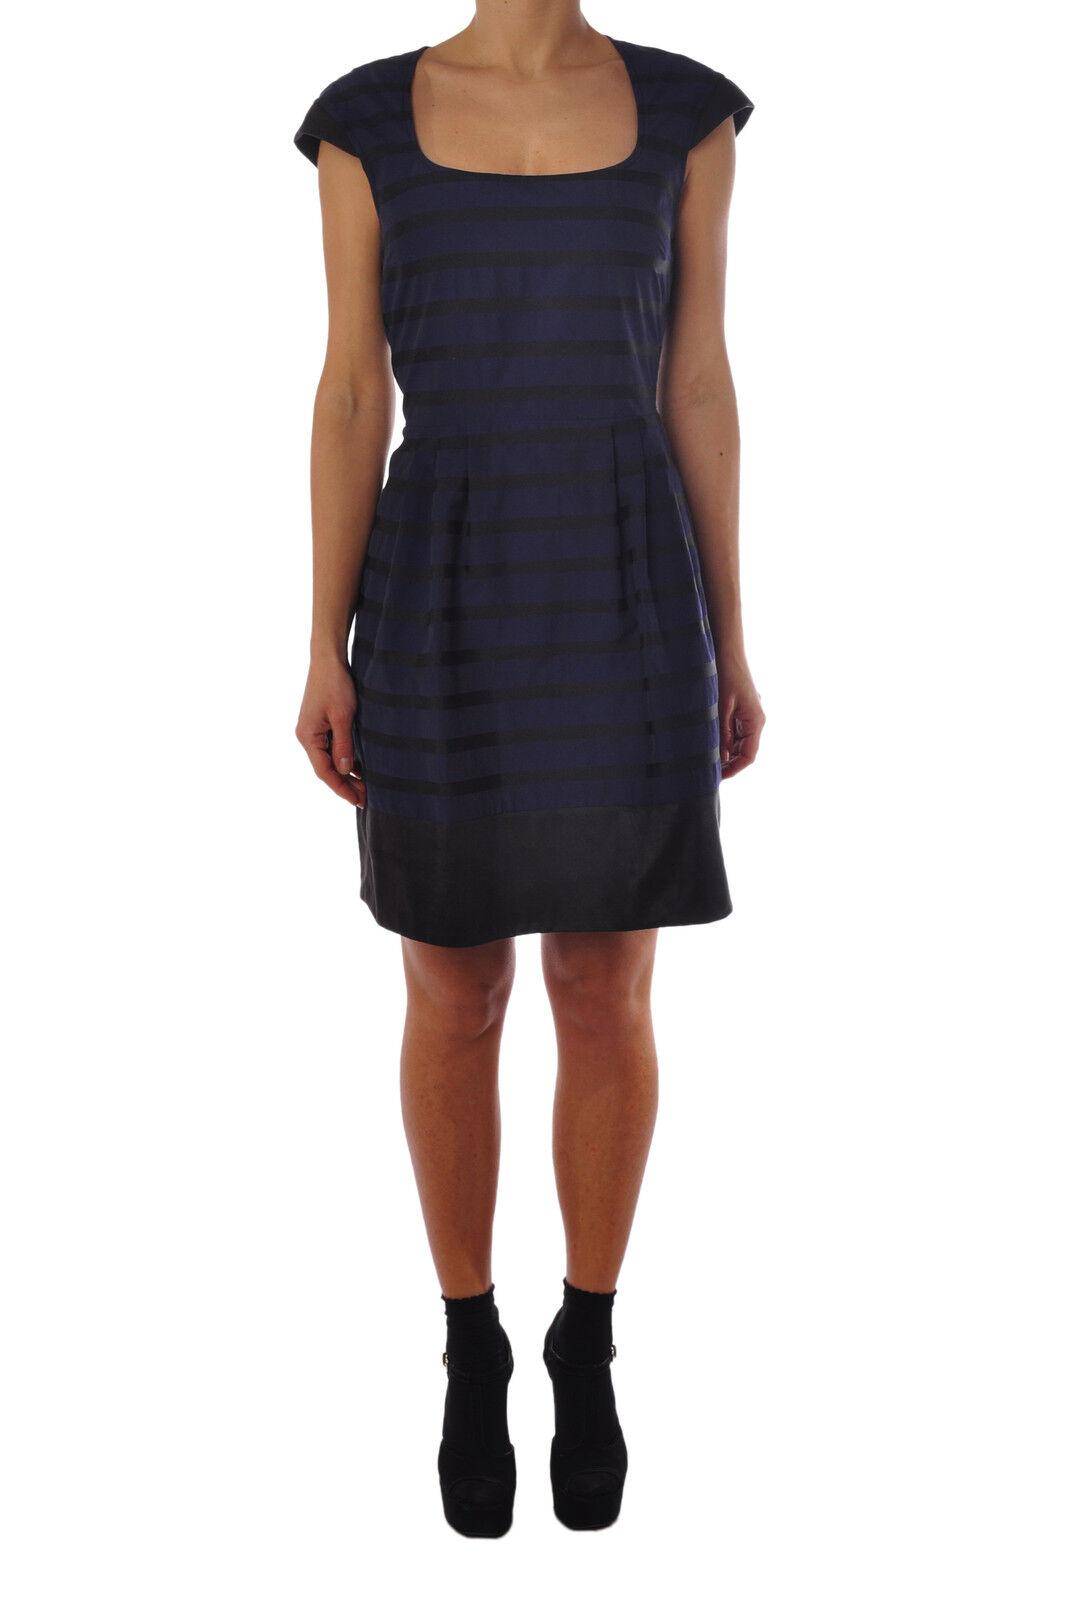 Patrizia Pepe  -  Length - Female - 42 - bluee - 1349503B161018